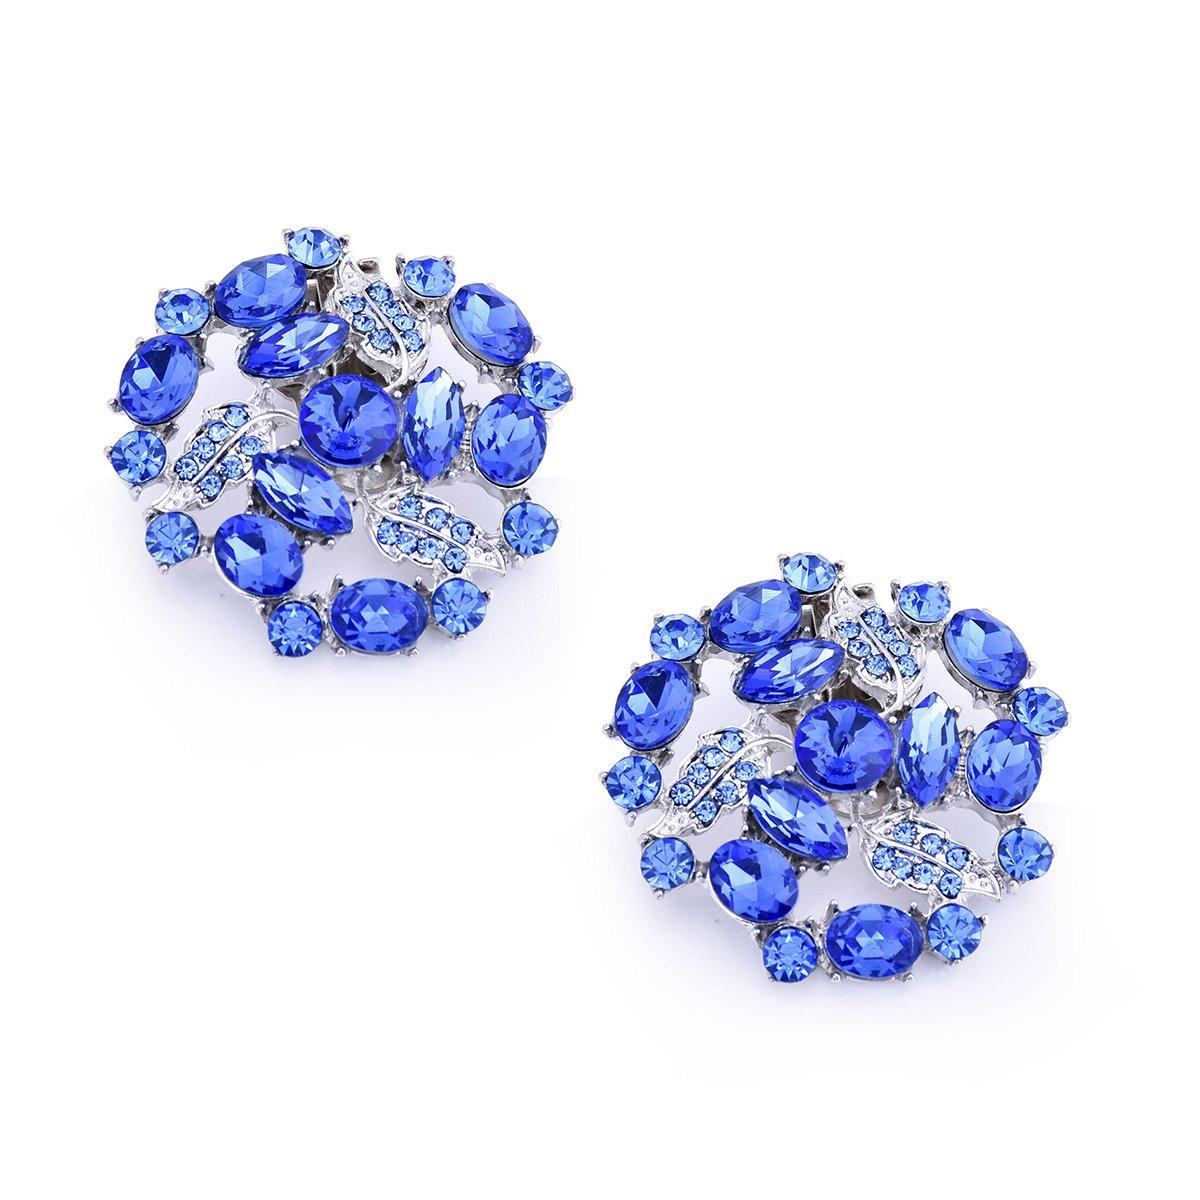 ElegantPark AM Women Rhinestones Decoration Wedding Party Shoe Clips 2 Pcs Blue